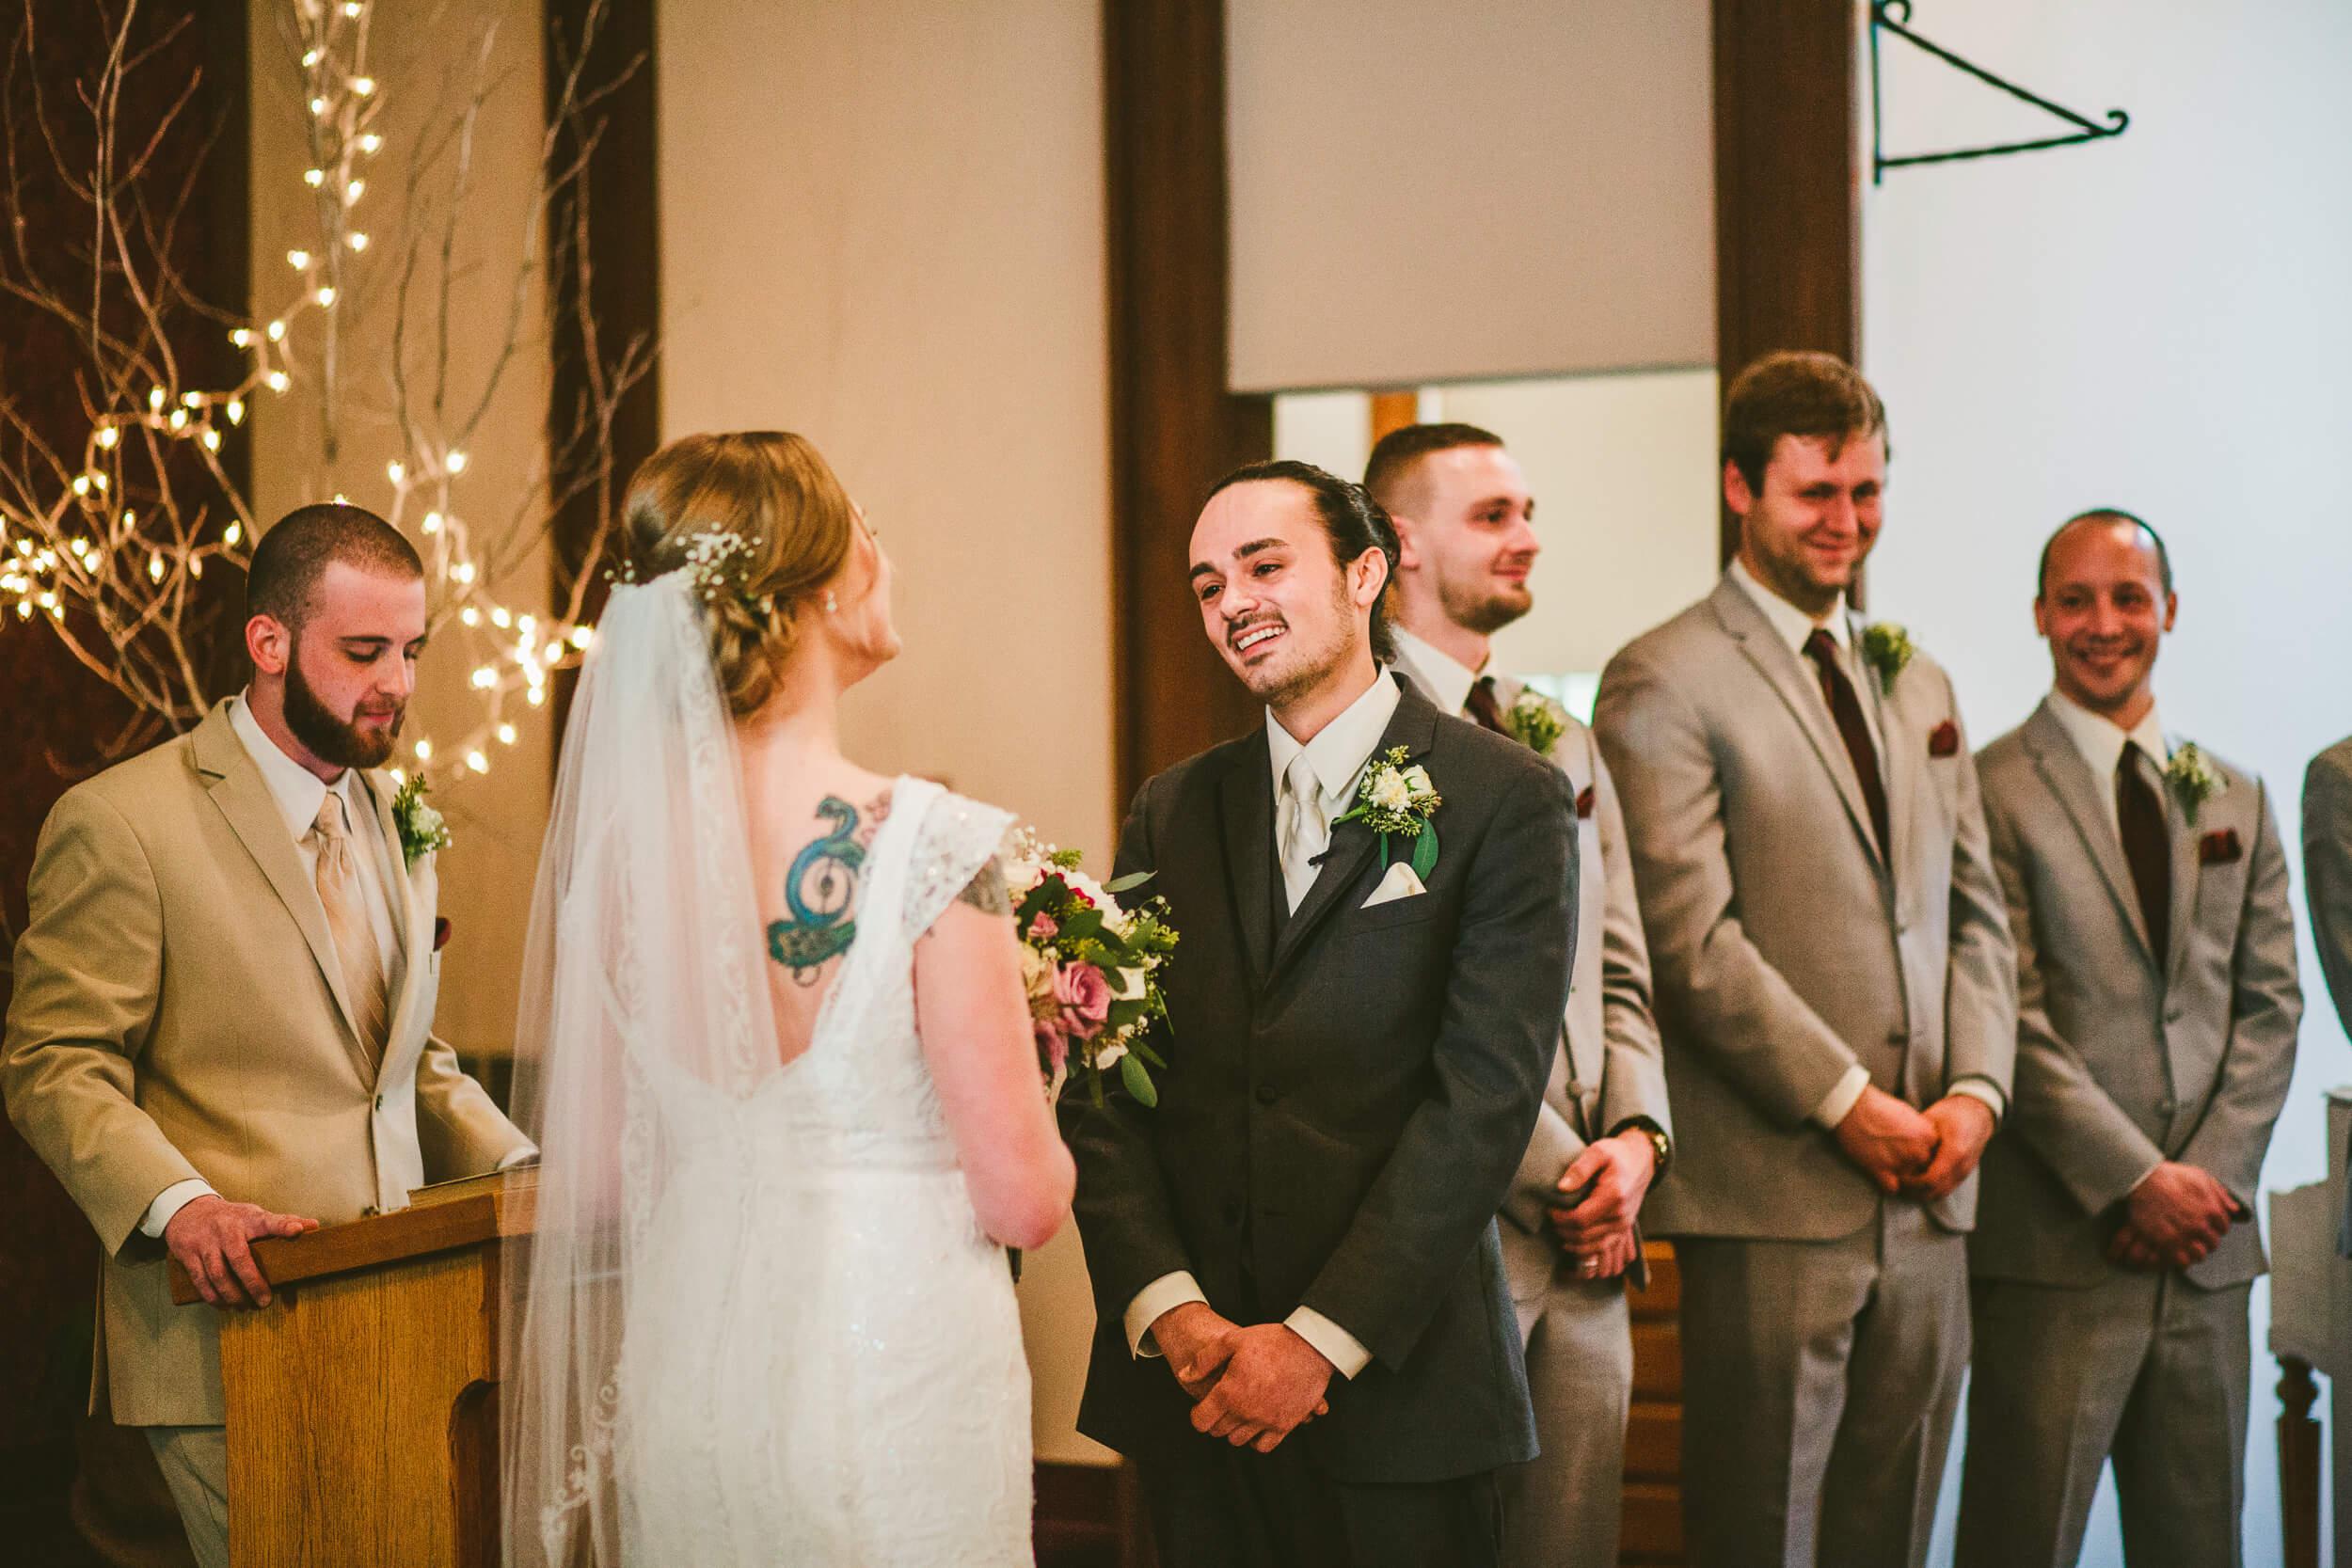 mukogawa winter wedding in spokane (161).jpg